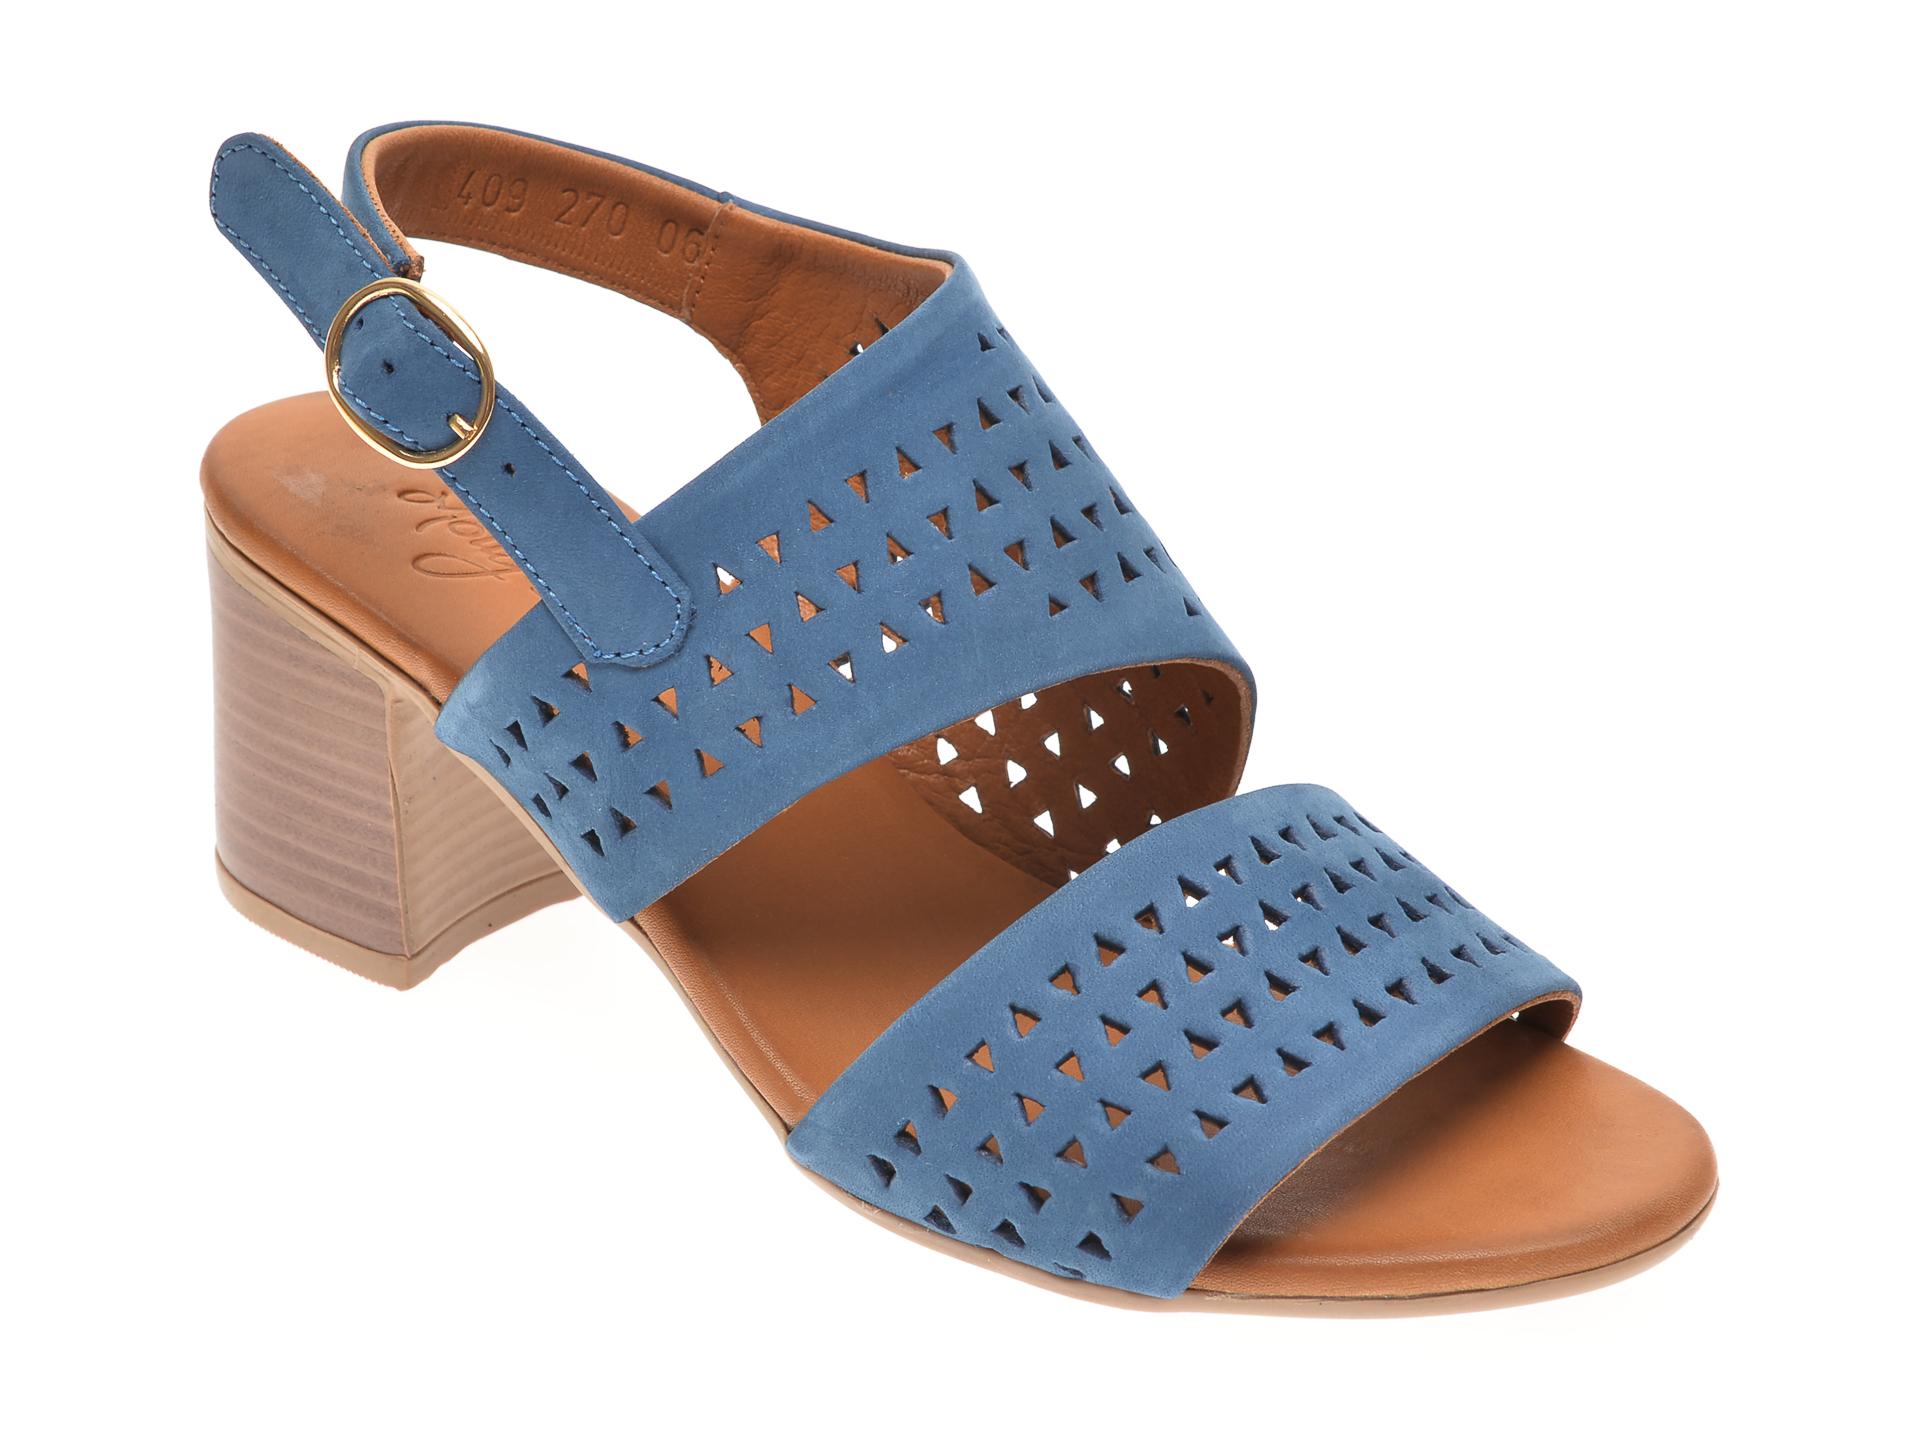 Sandale MOLLY BESSA bleumarin, 409270, din piele naturala New